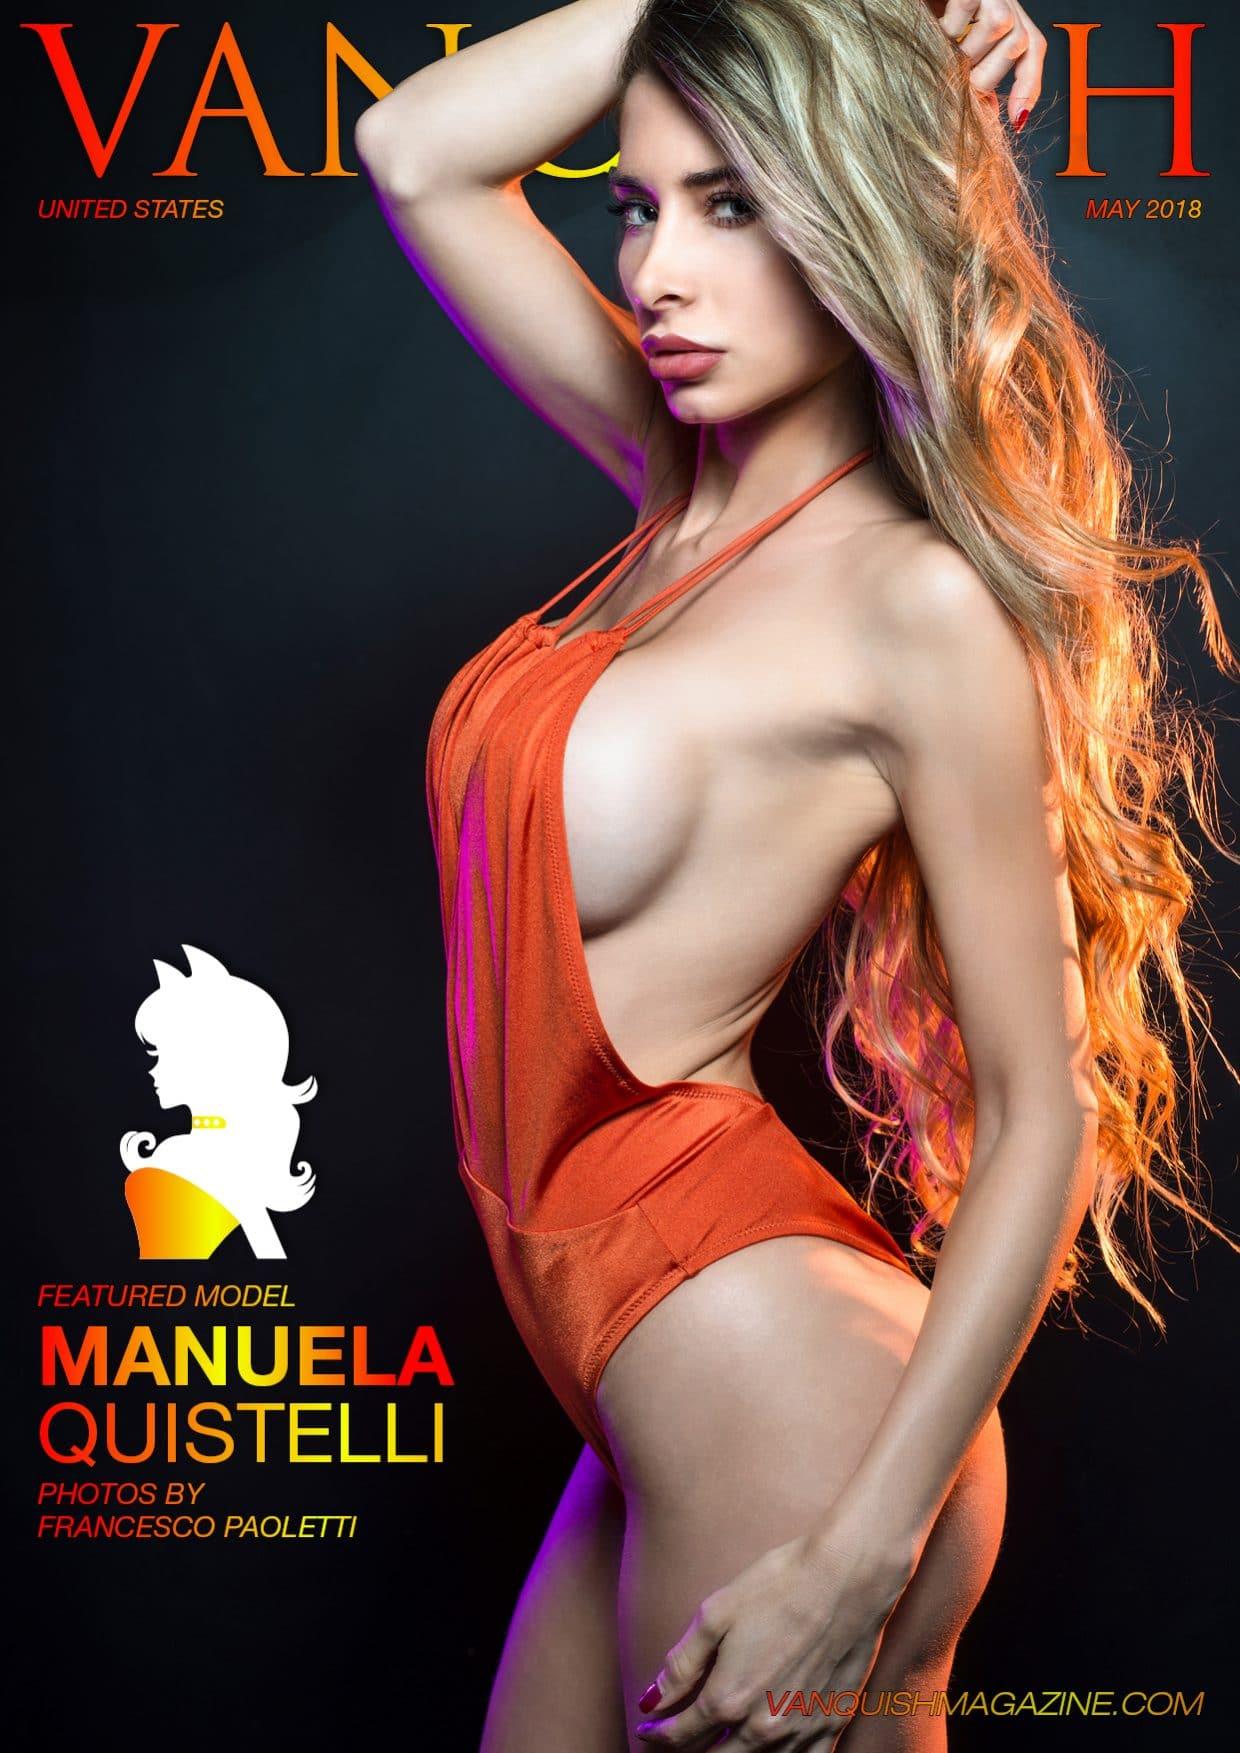 Vanquish Magazine - May 2018 - Manuela Quistelli 1